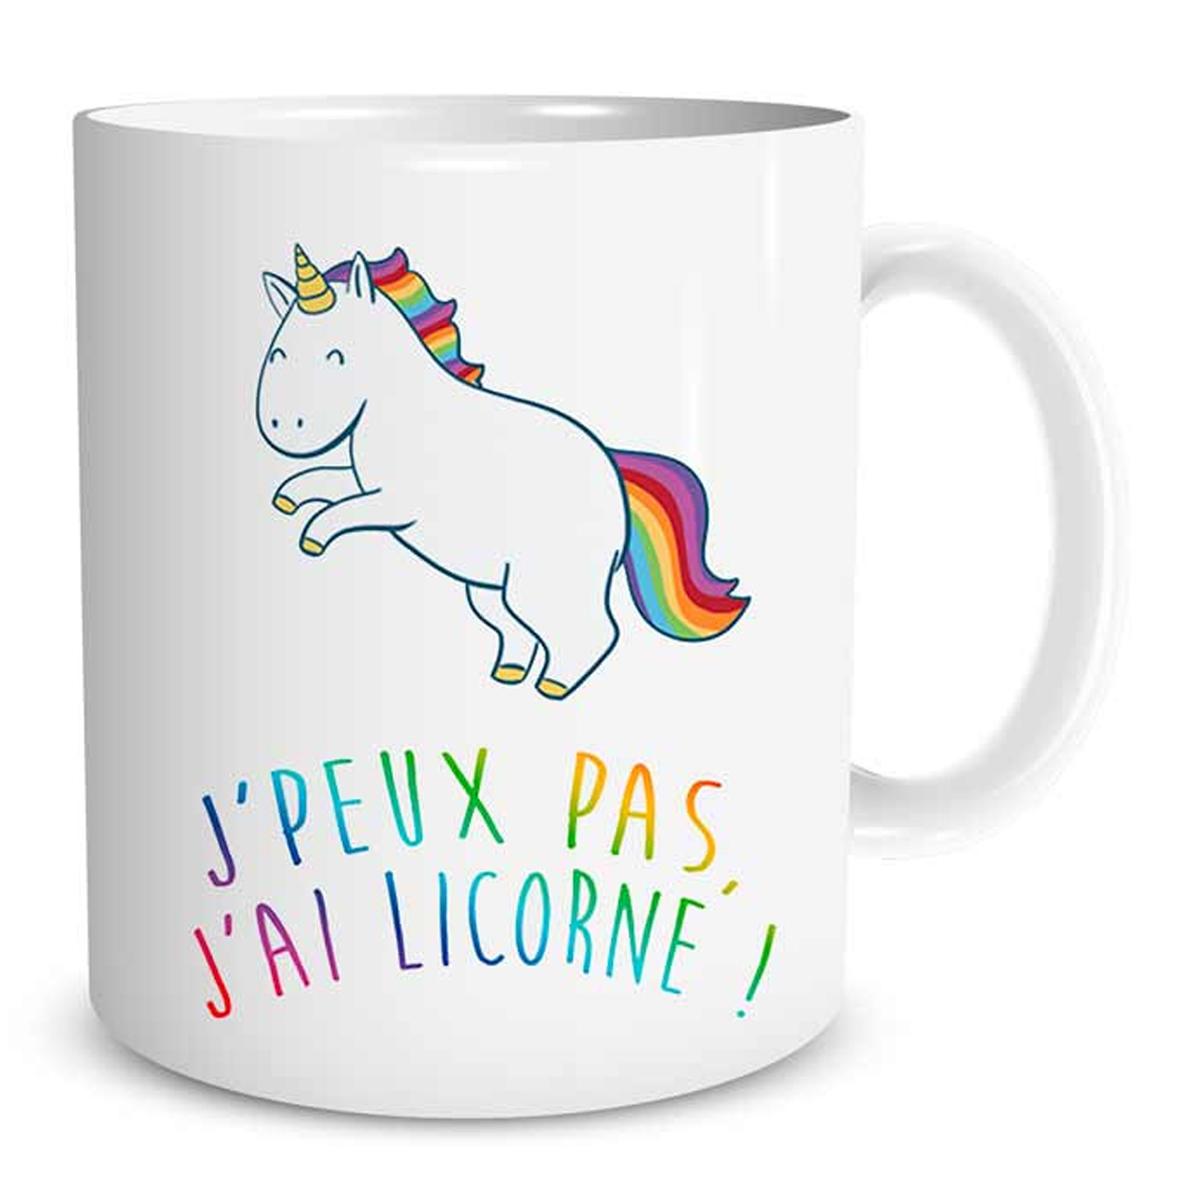 Mug Licorne J'peux pas, j'ai licorne ! LULU shop